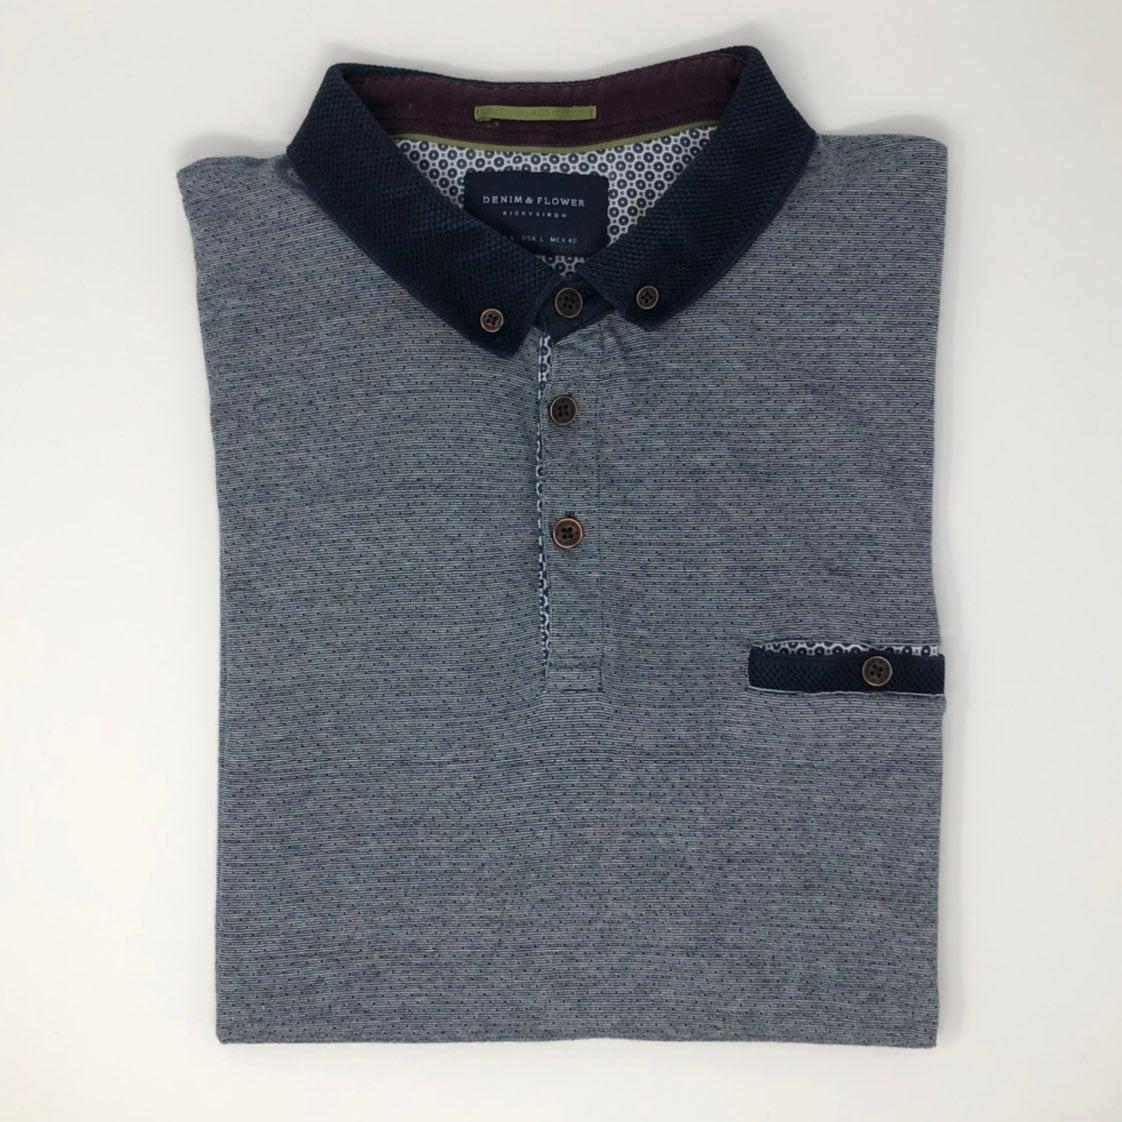 Denim & Flower Polo Shirt